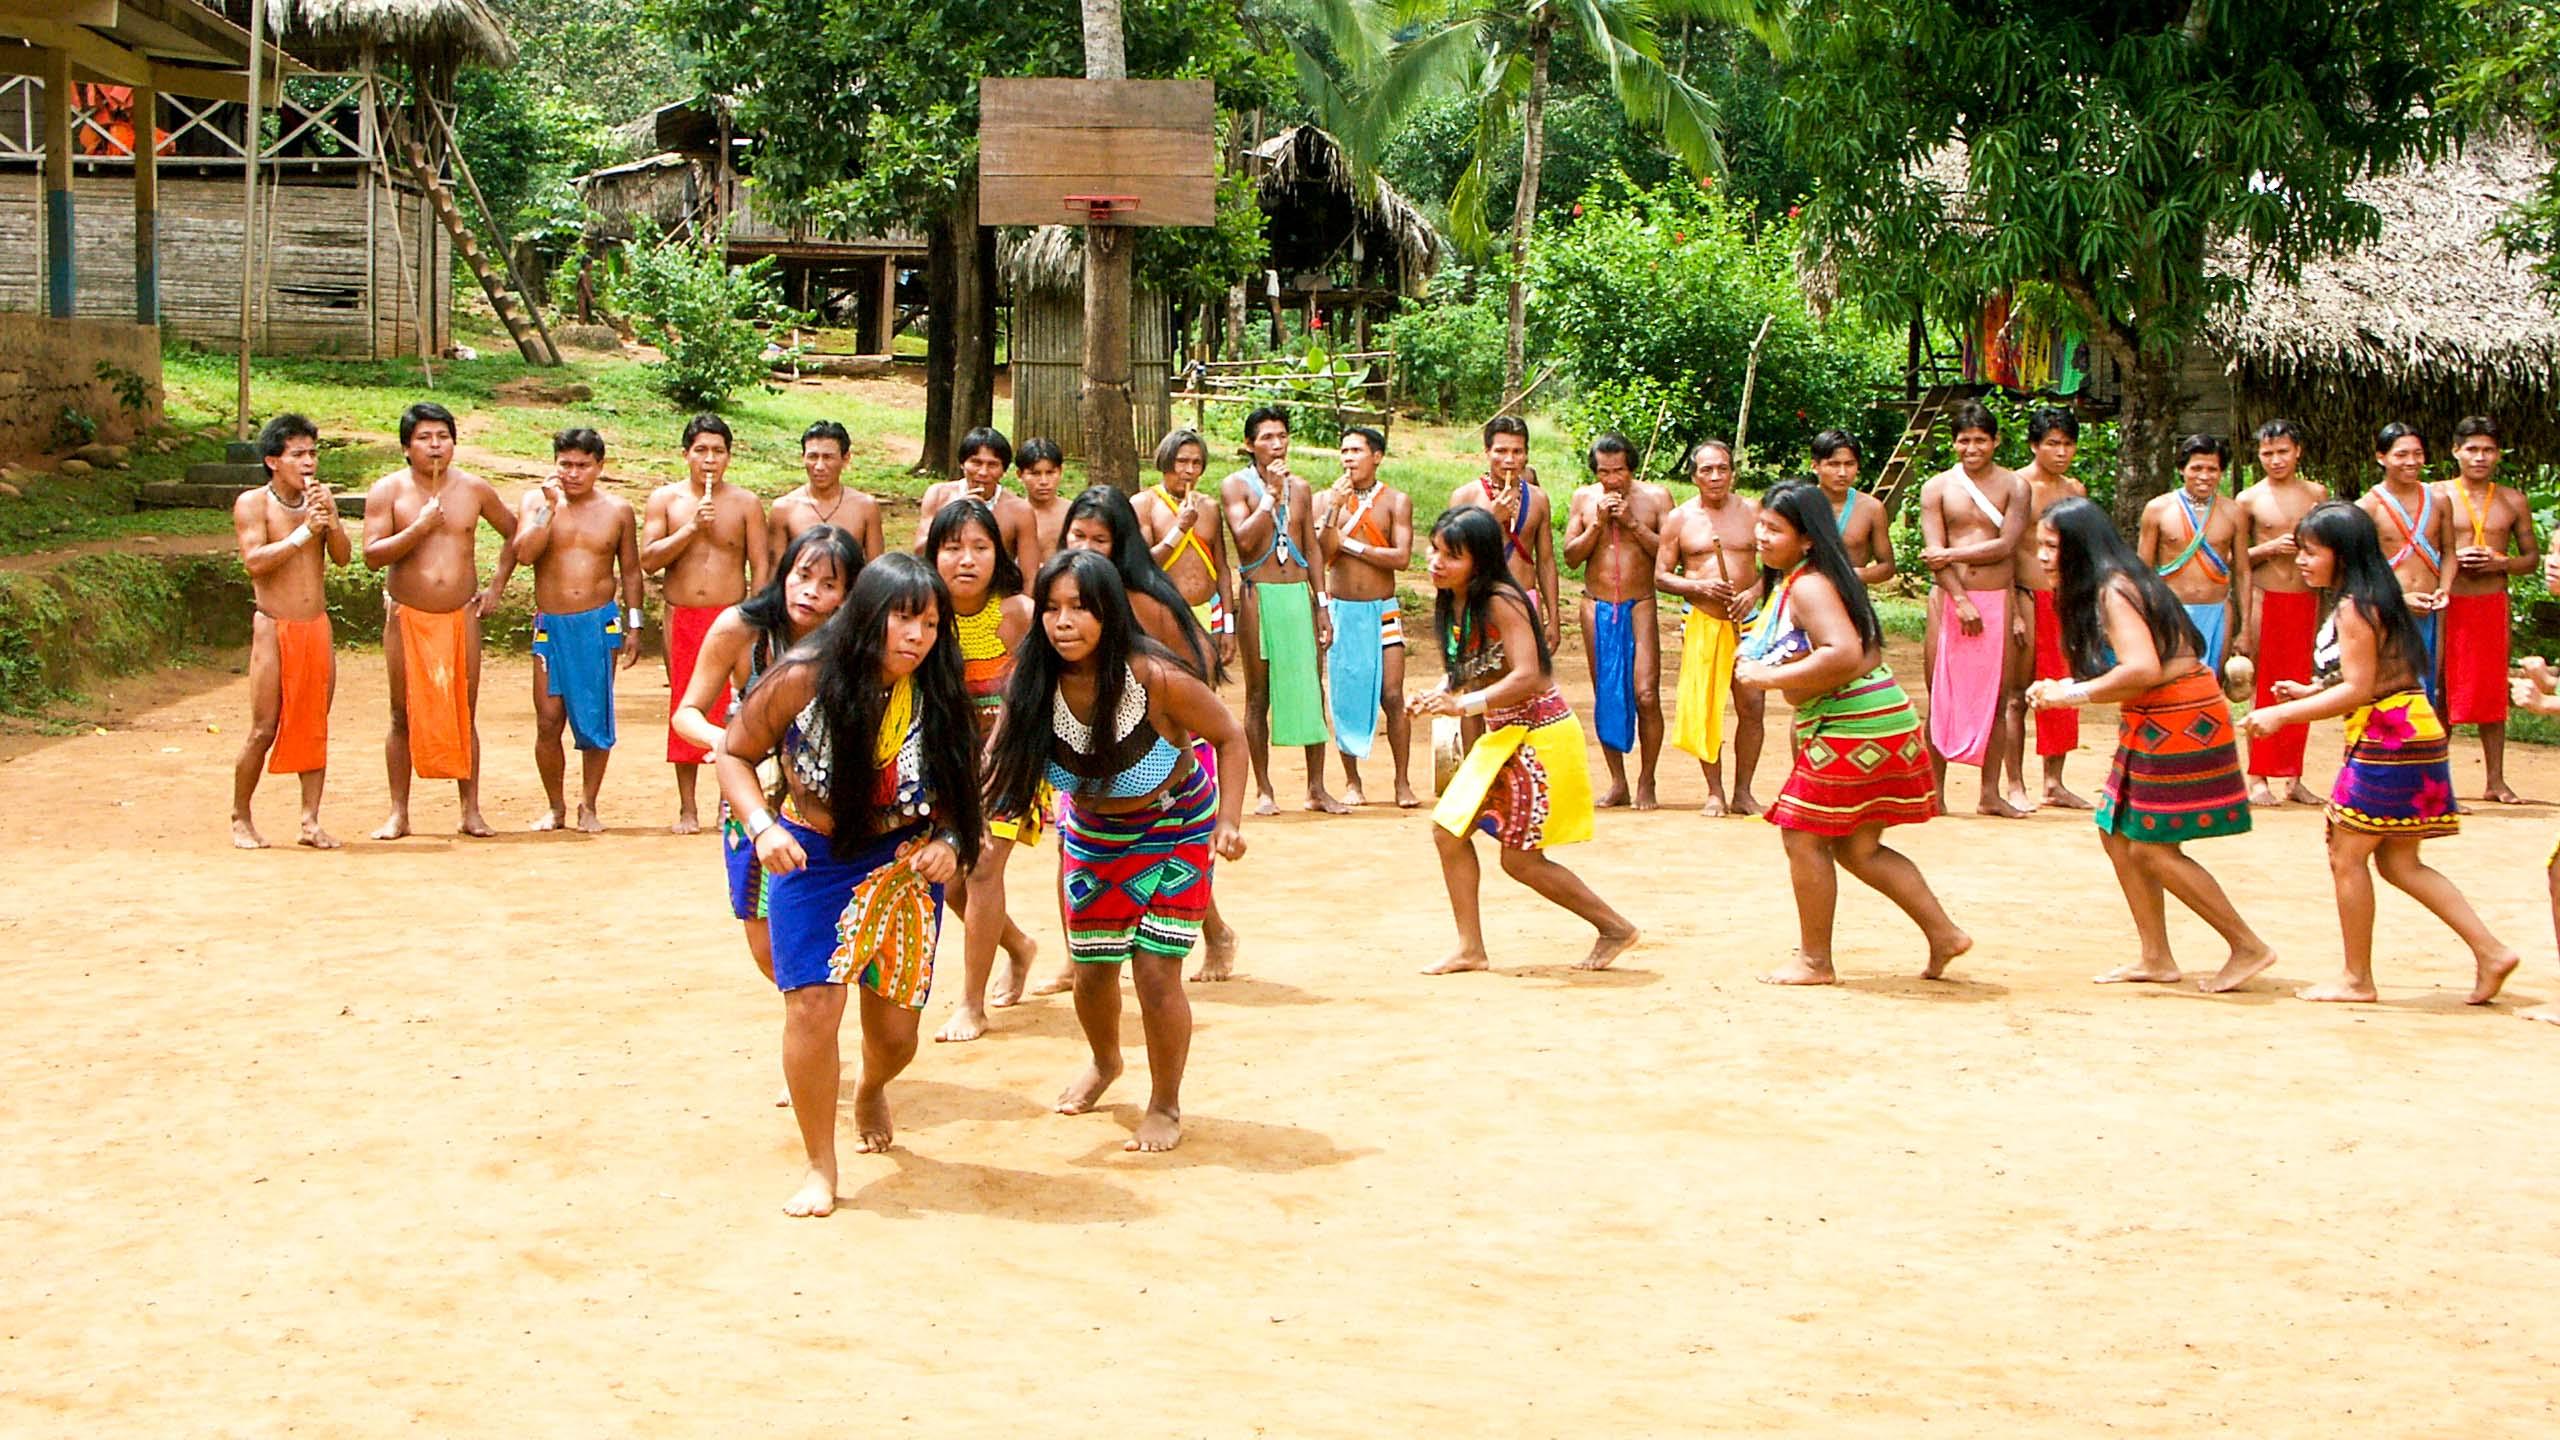 Panama village plays group game